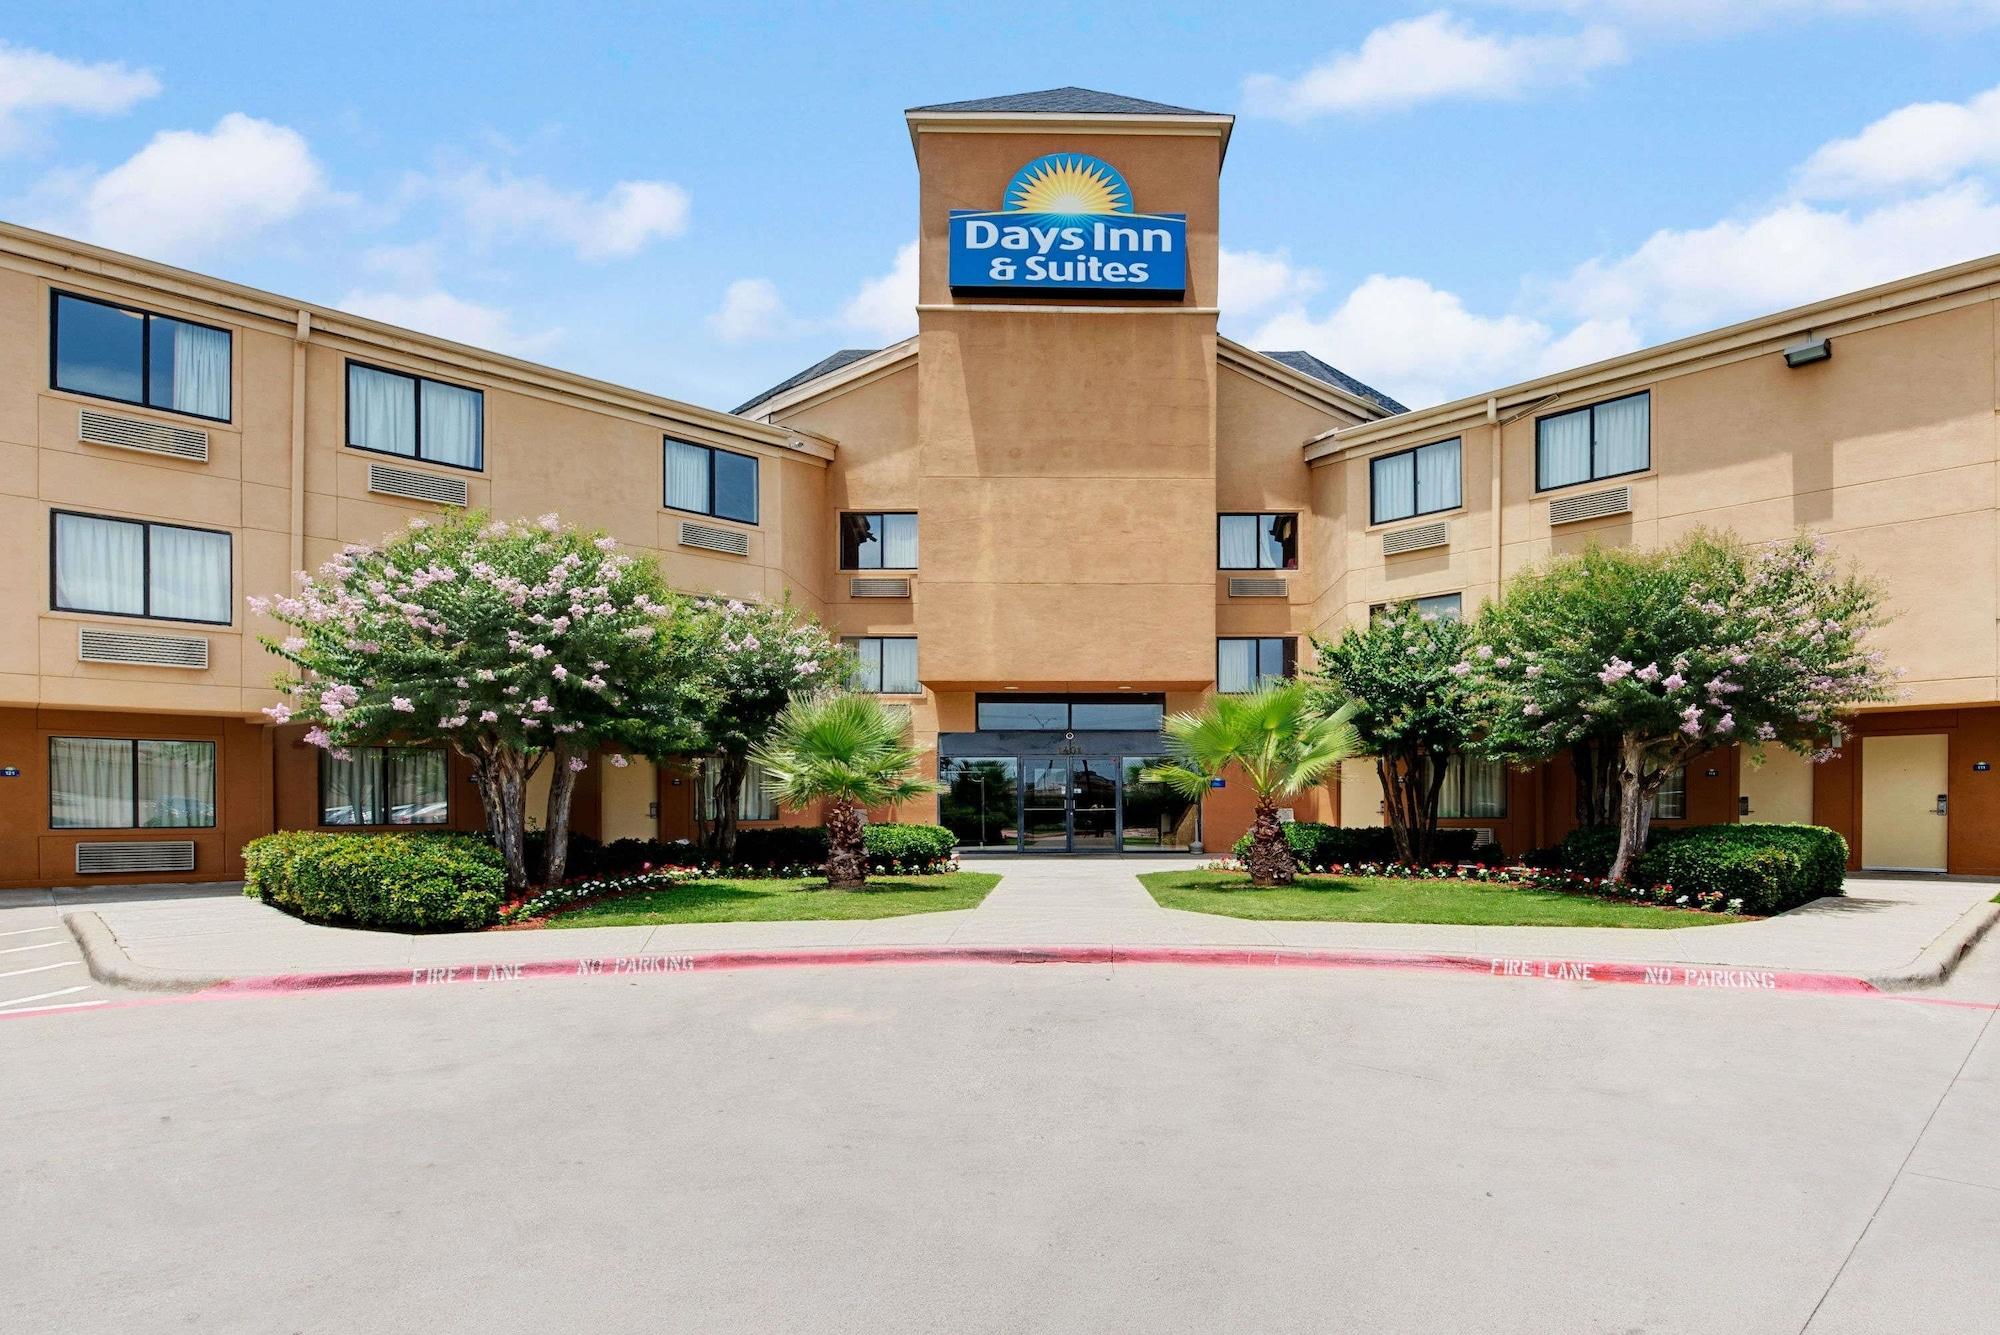 Days Inn & Suites by Wyndham DeSoto, Dallas